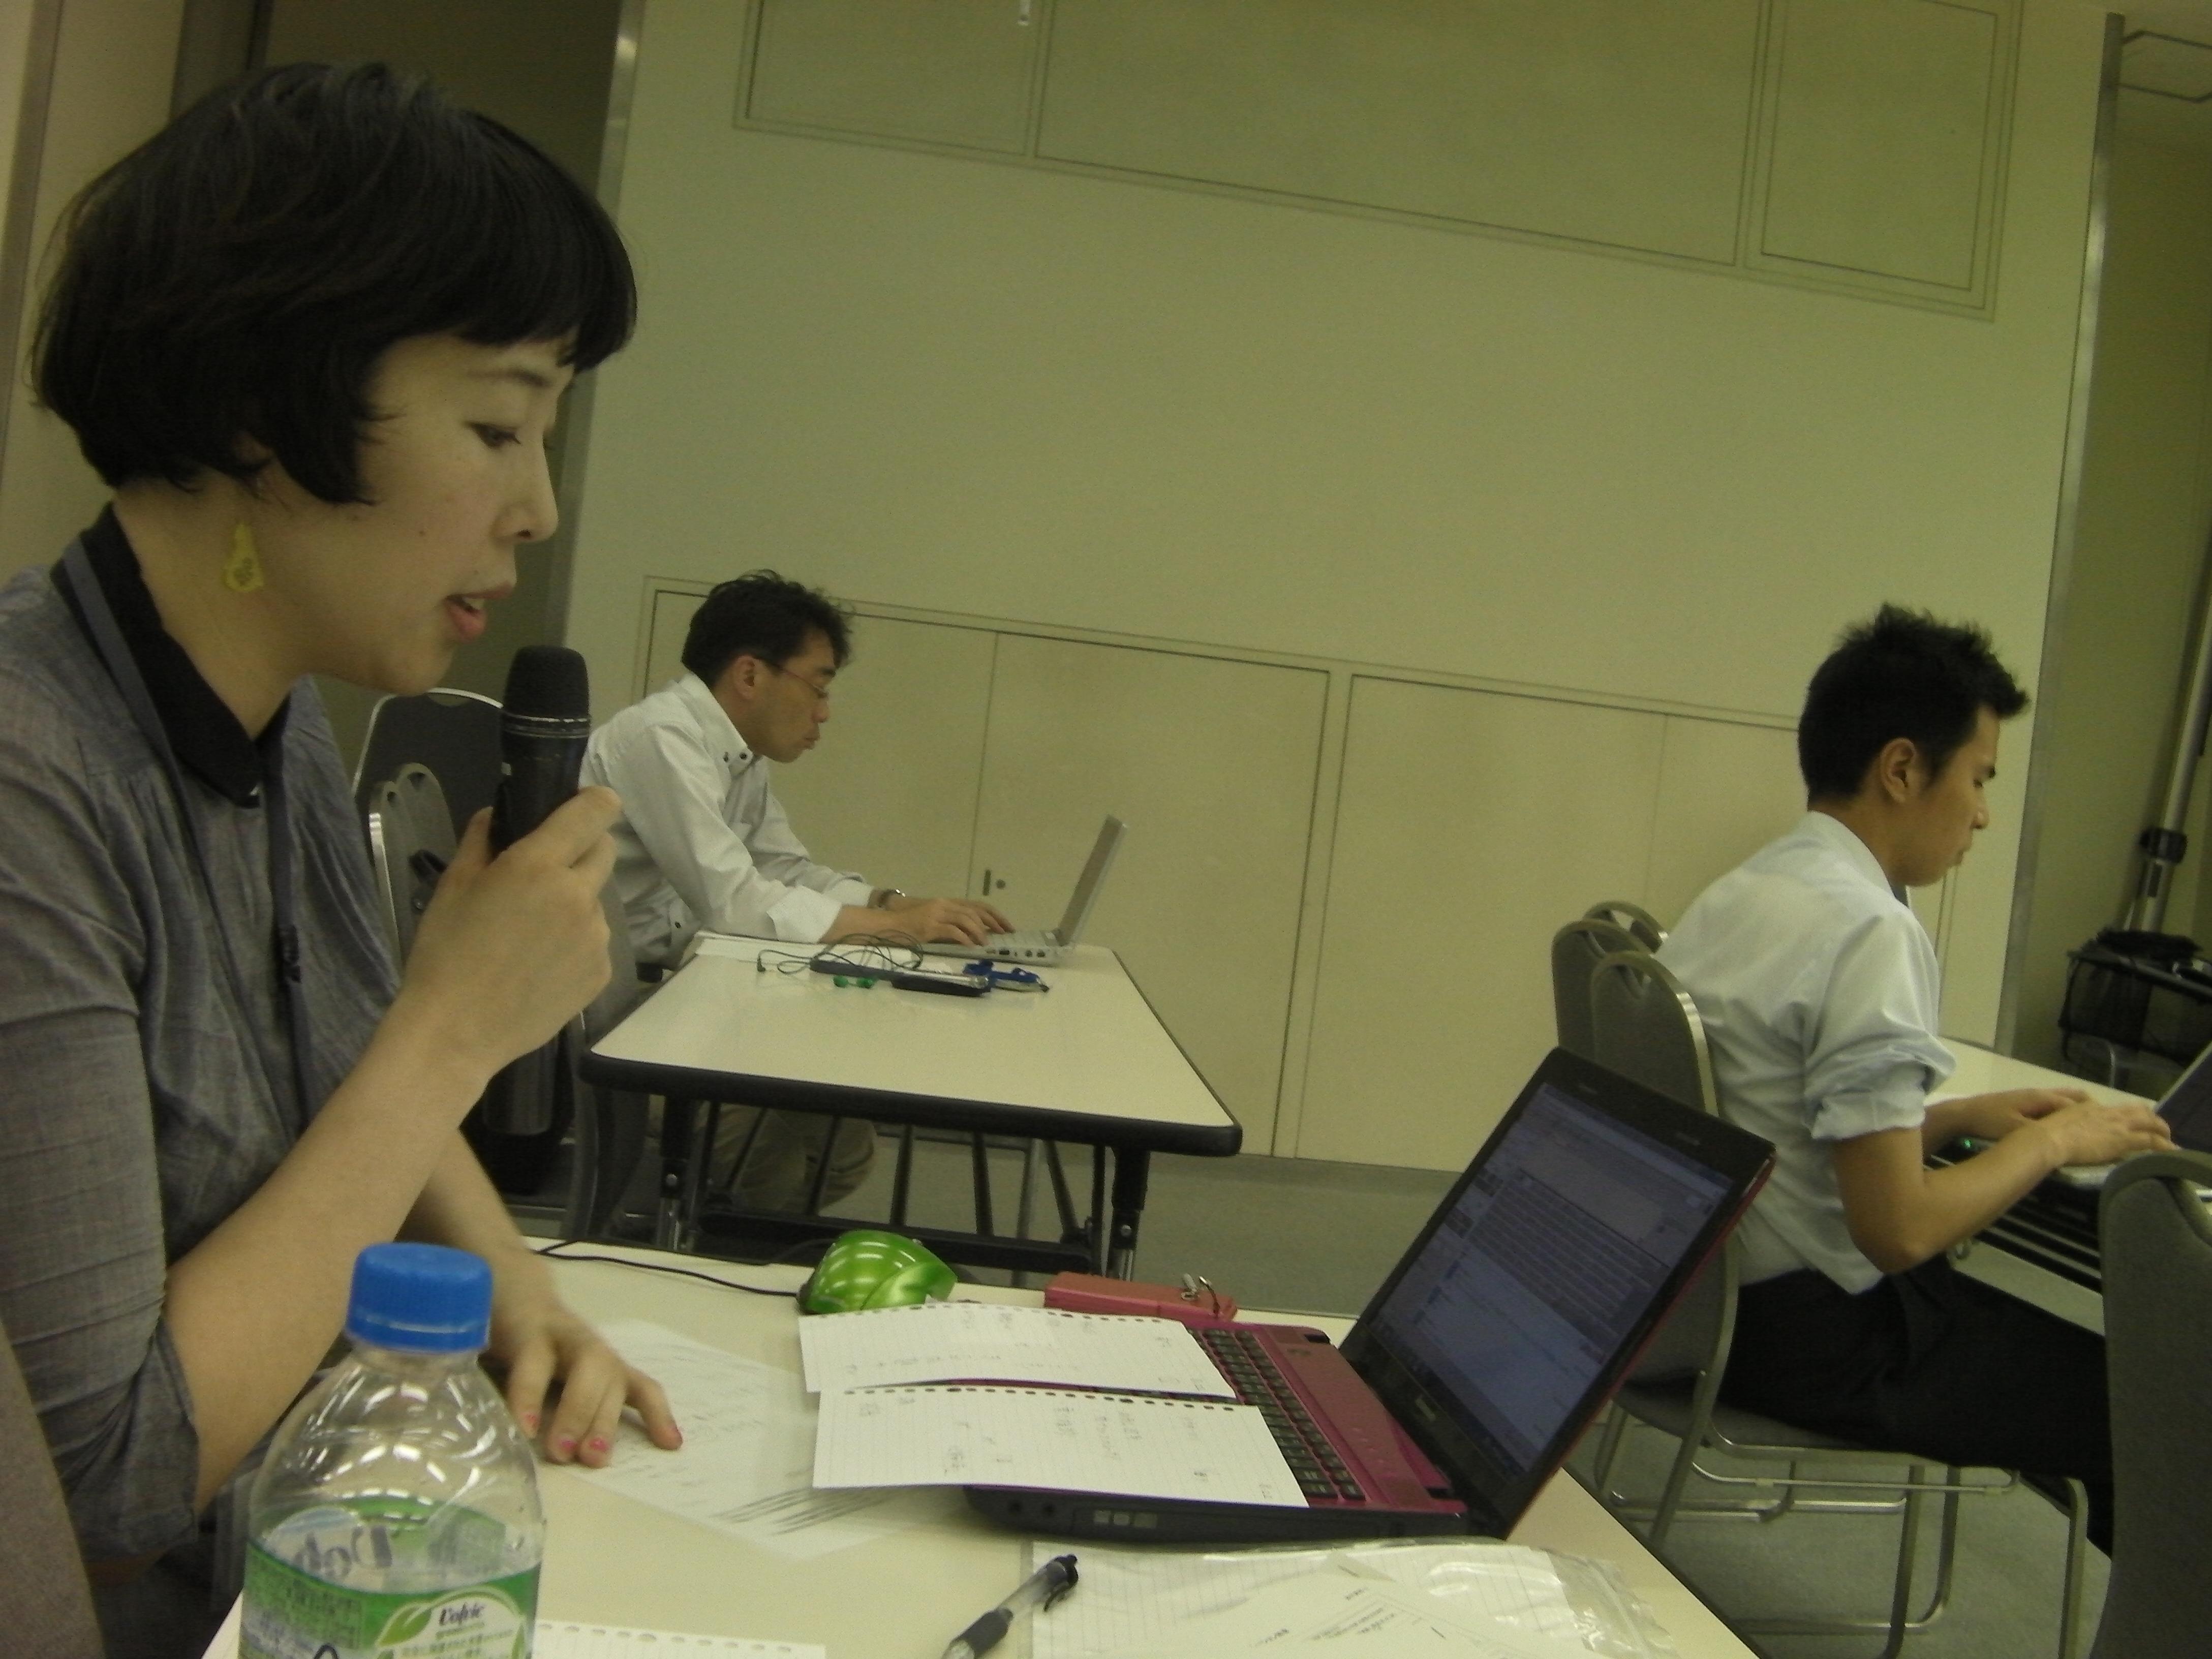 http://daily.magazine9.jp/m9/oshidori/SANY0497.JPG